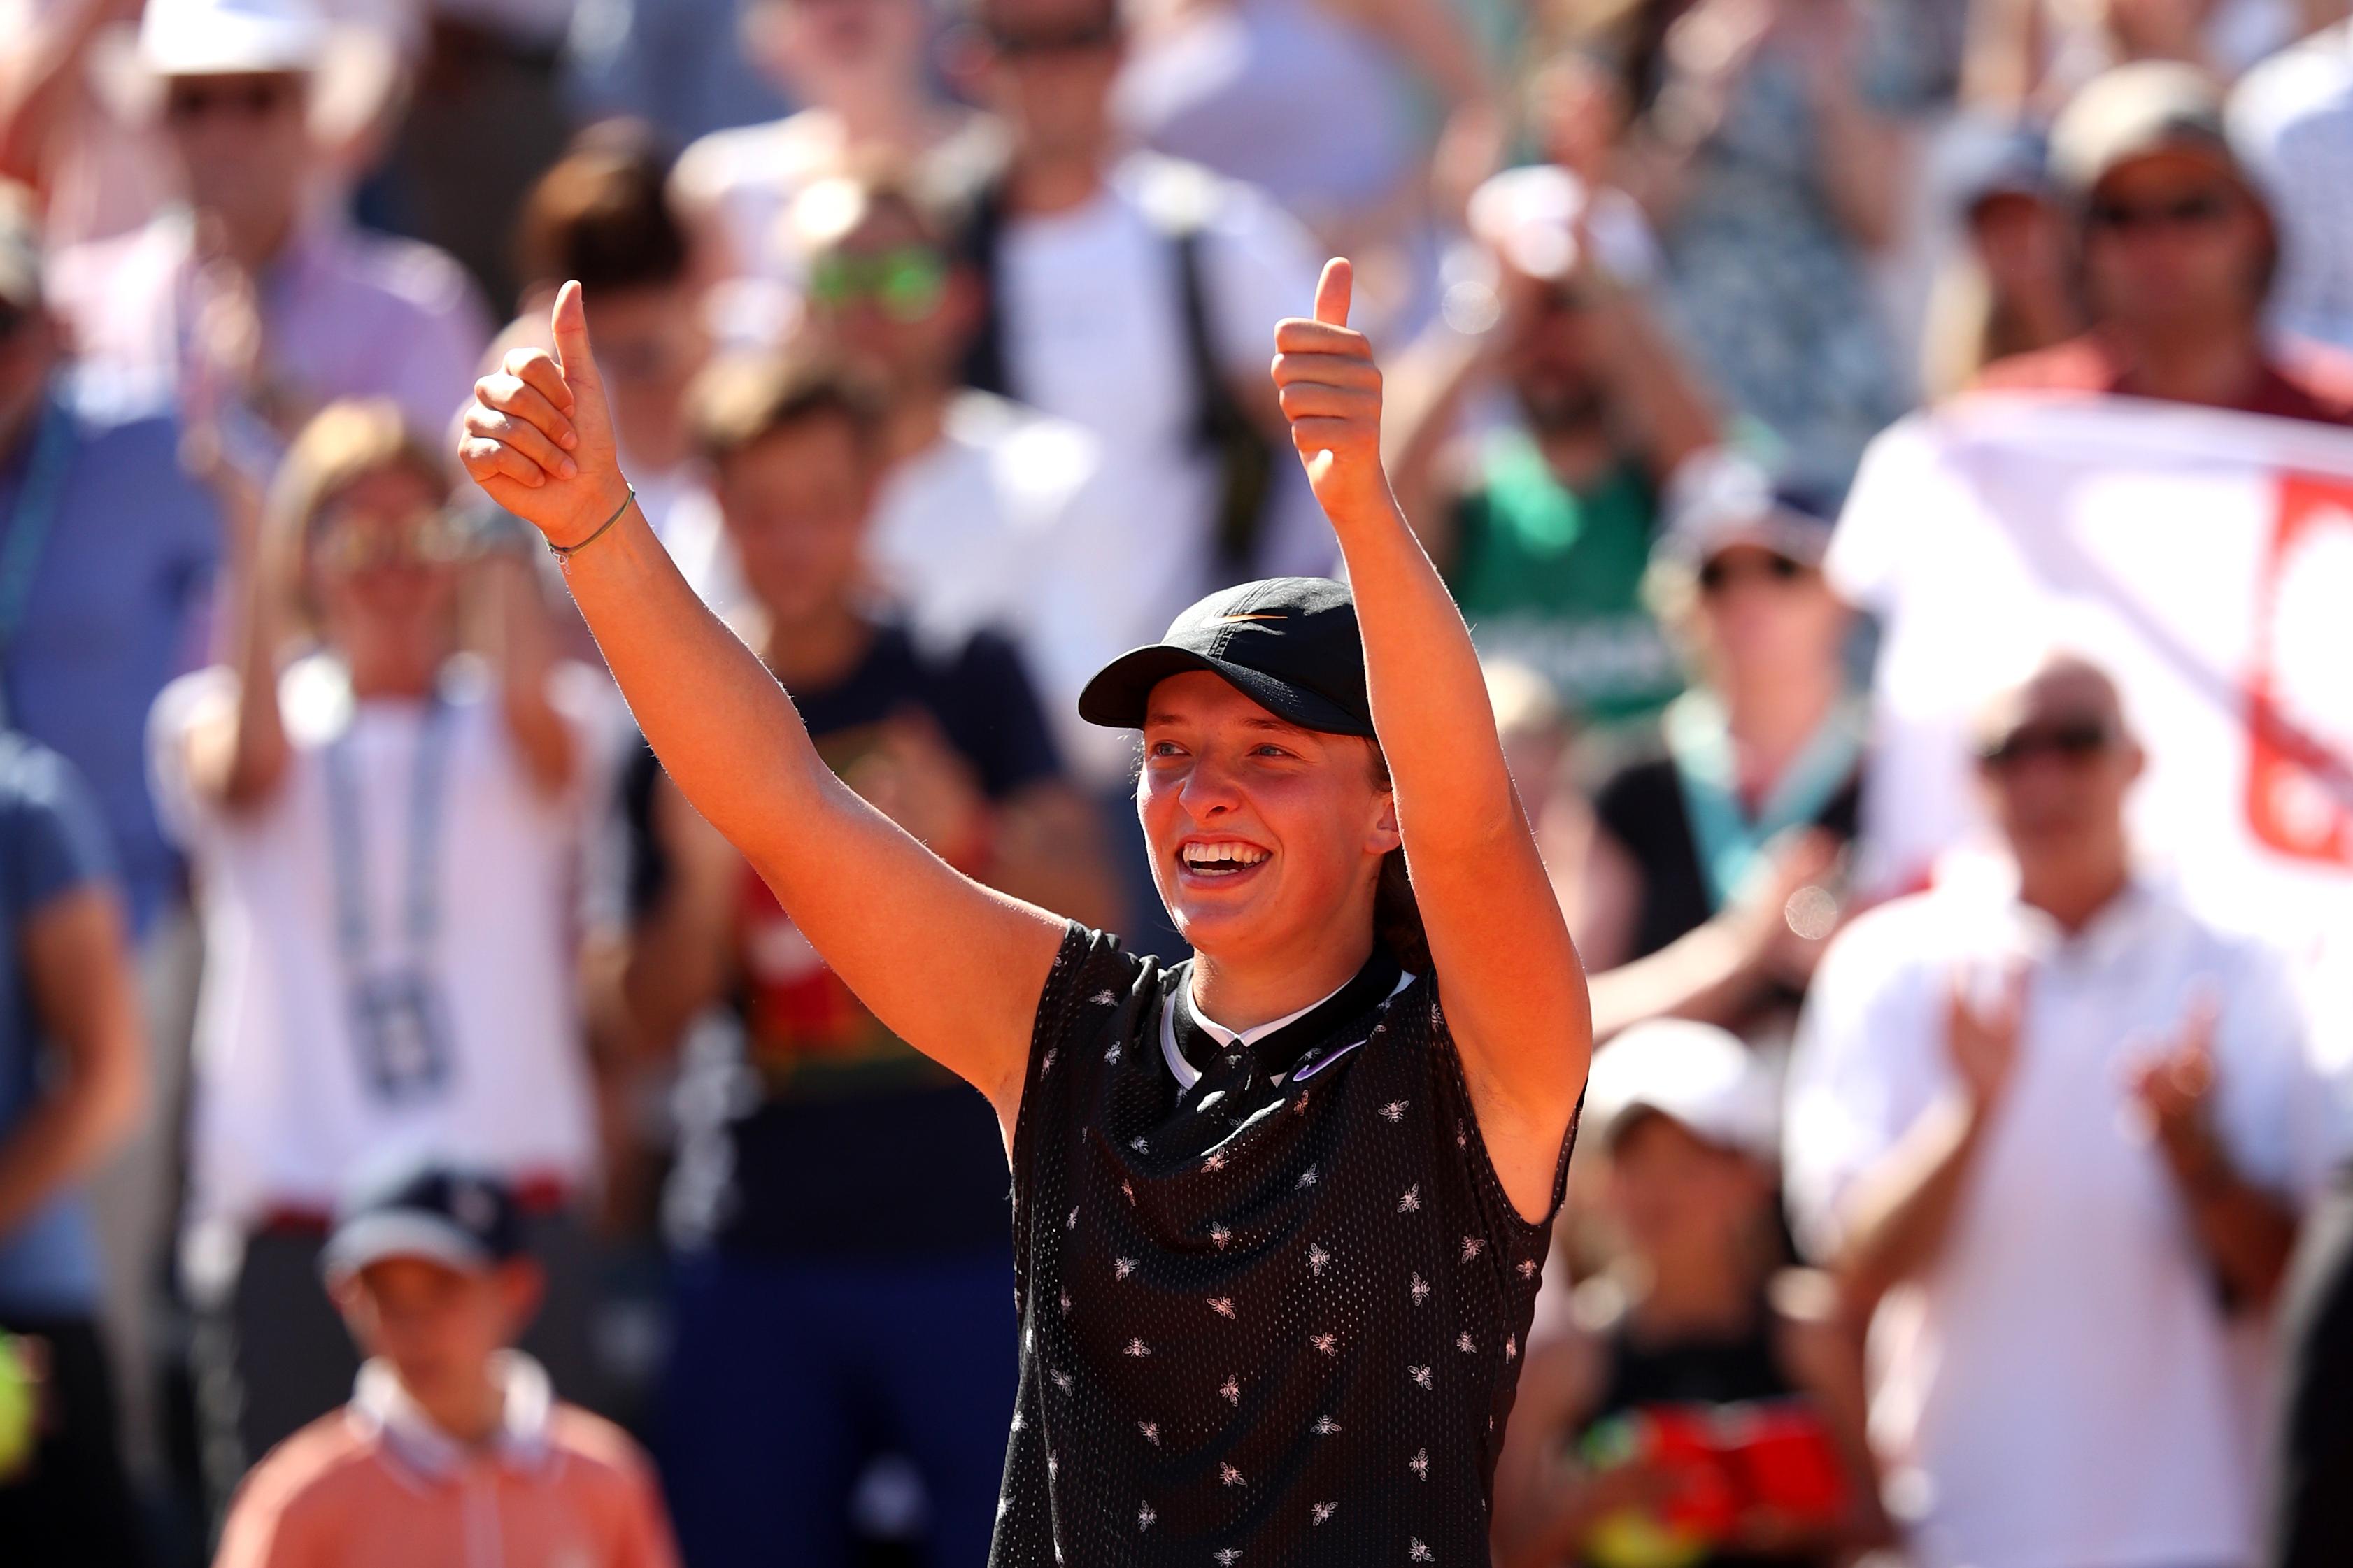 WTA Scouting Report: Iga Swiatek takes her shot at the top